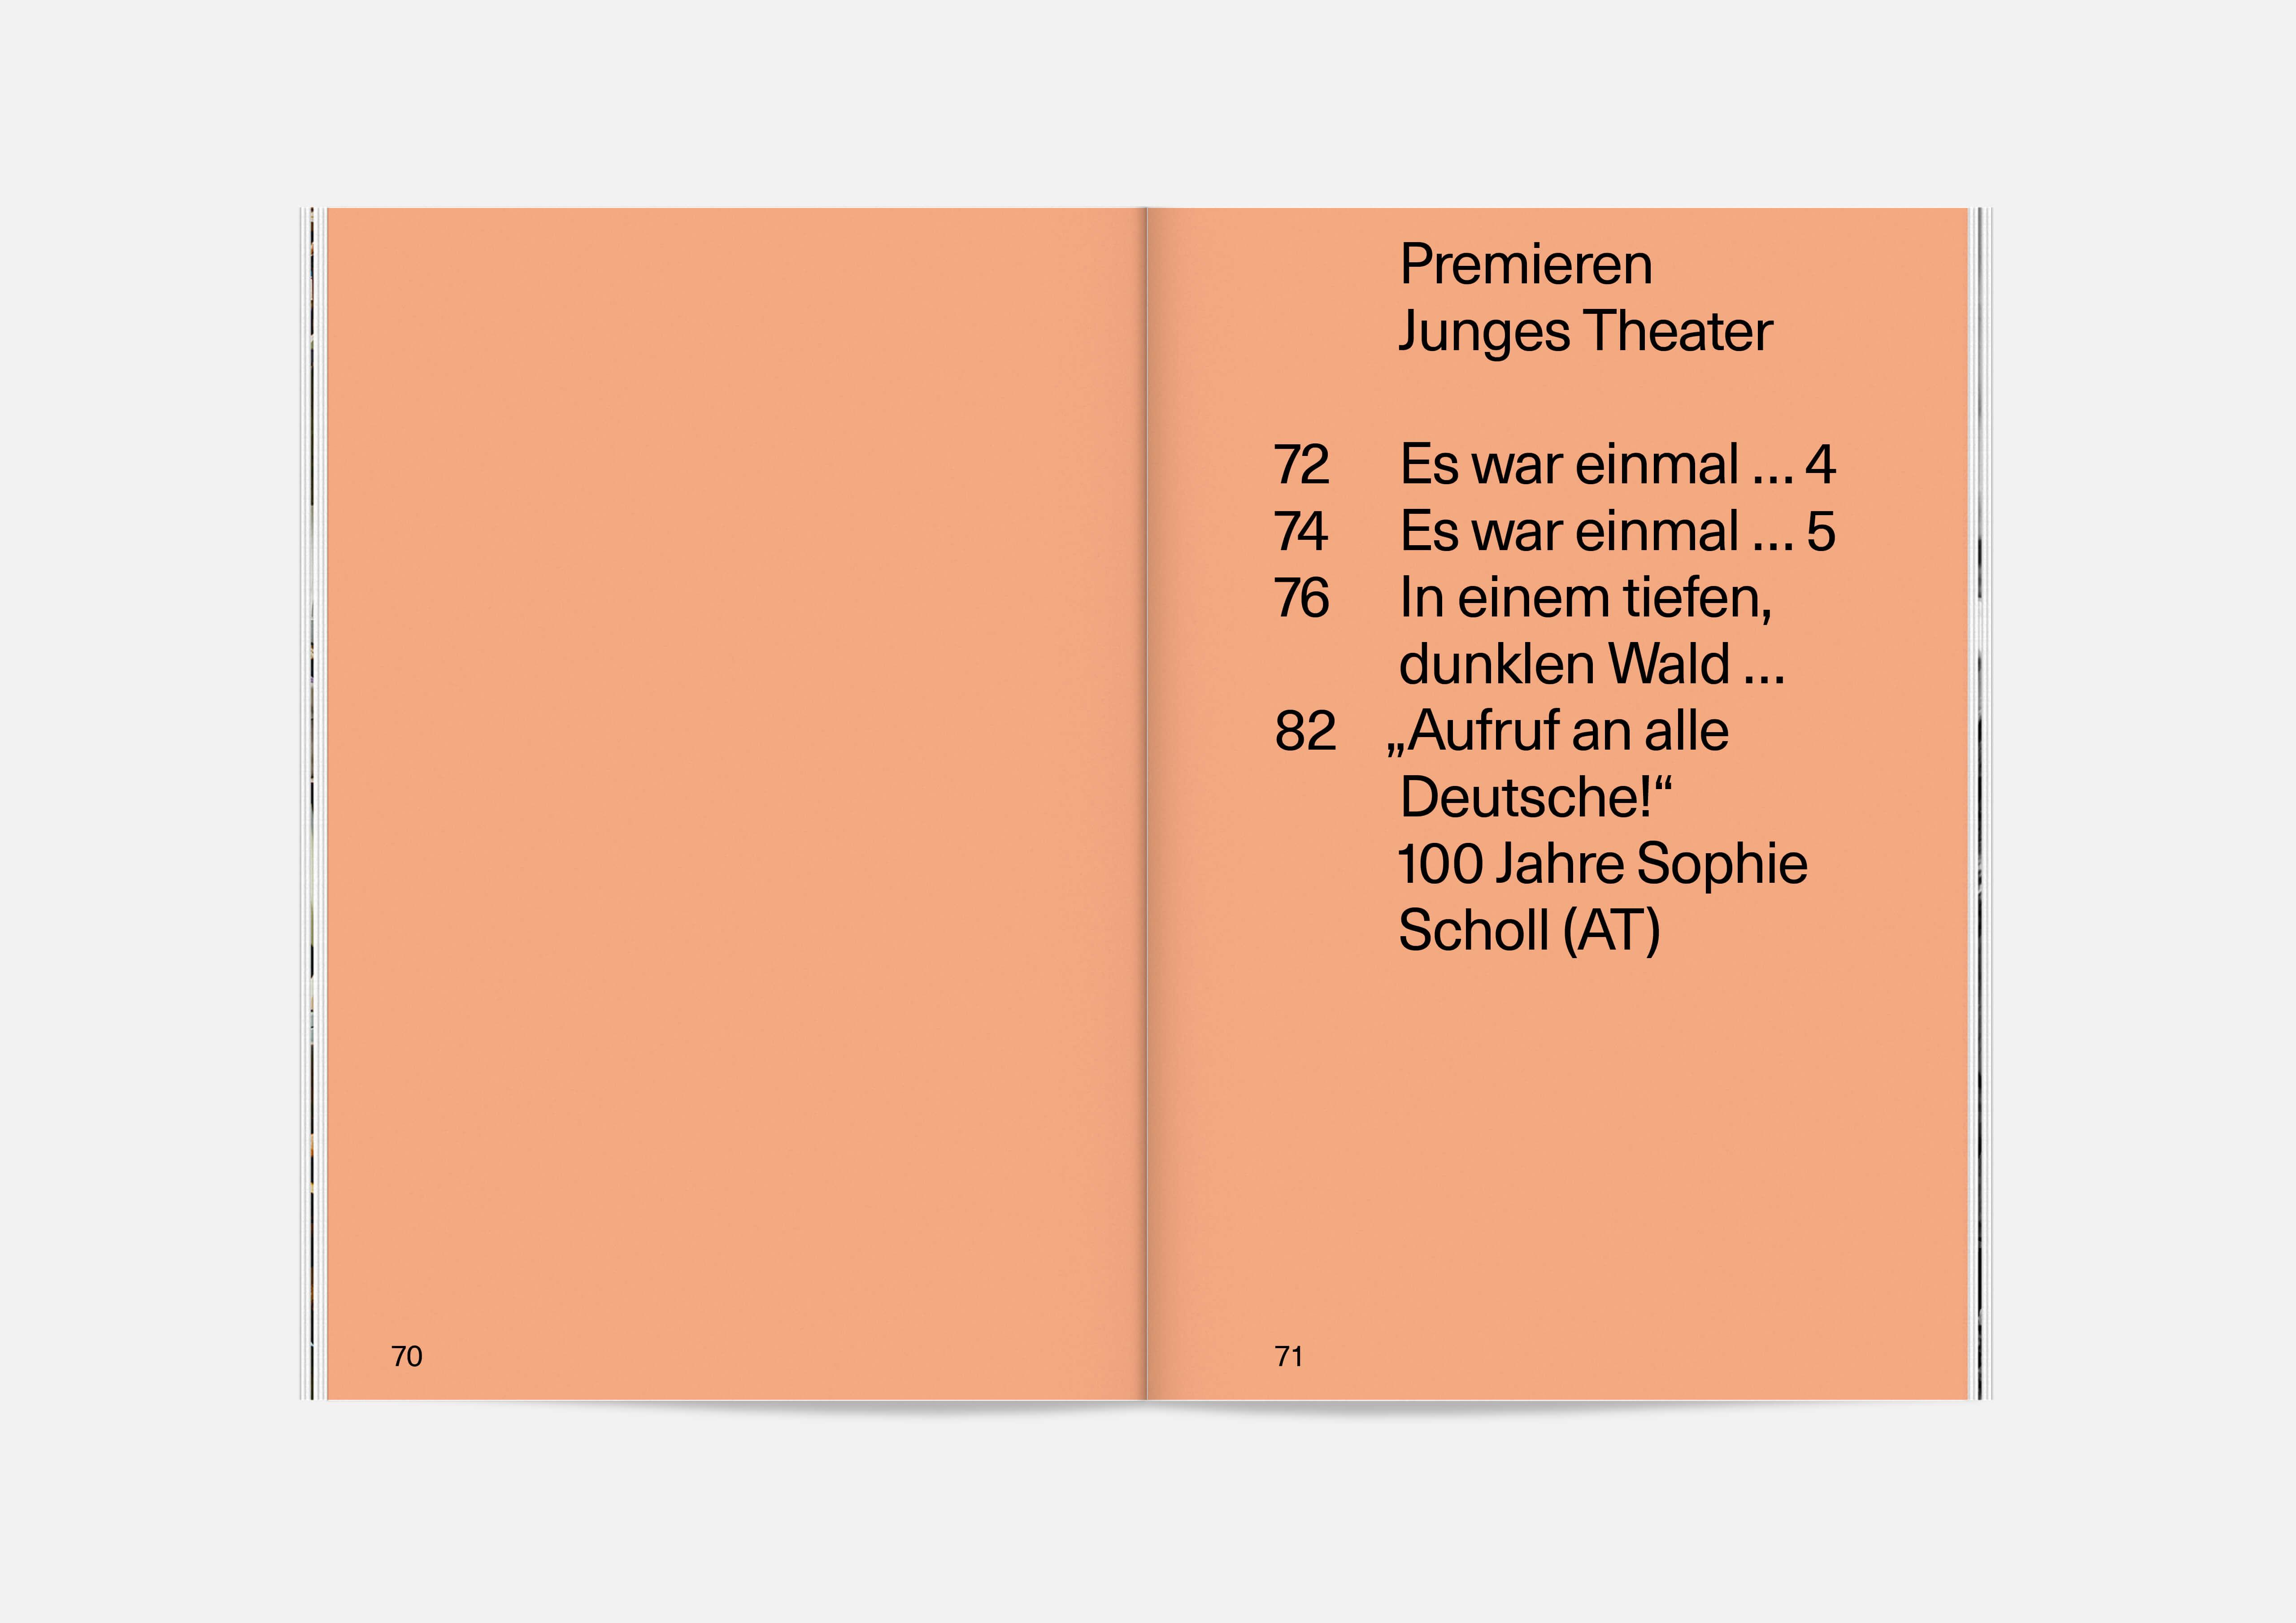 https://neuegestaltung.de/media/pages/clients/theater-erlangen-season-program-20-21/546e5a5ed9-1606409613/23_te-spielzeitheft2021.jpg